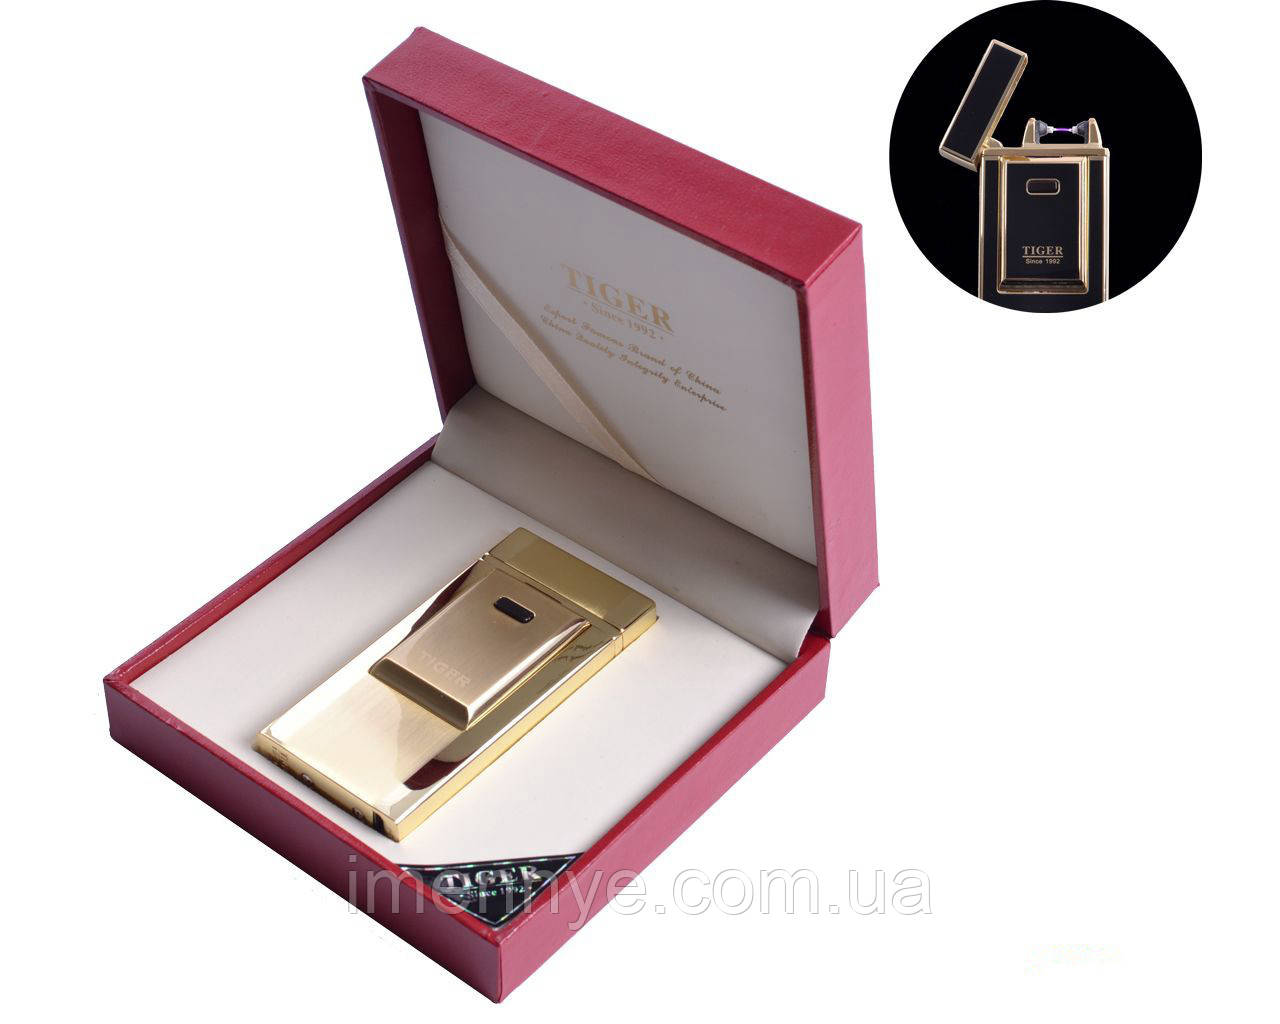 USB зажигалка TIGER на подарок